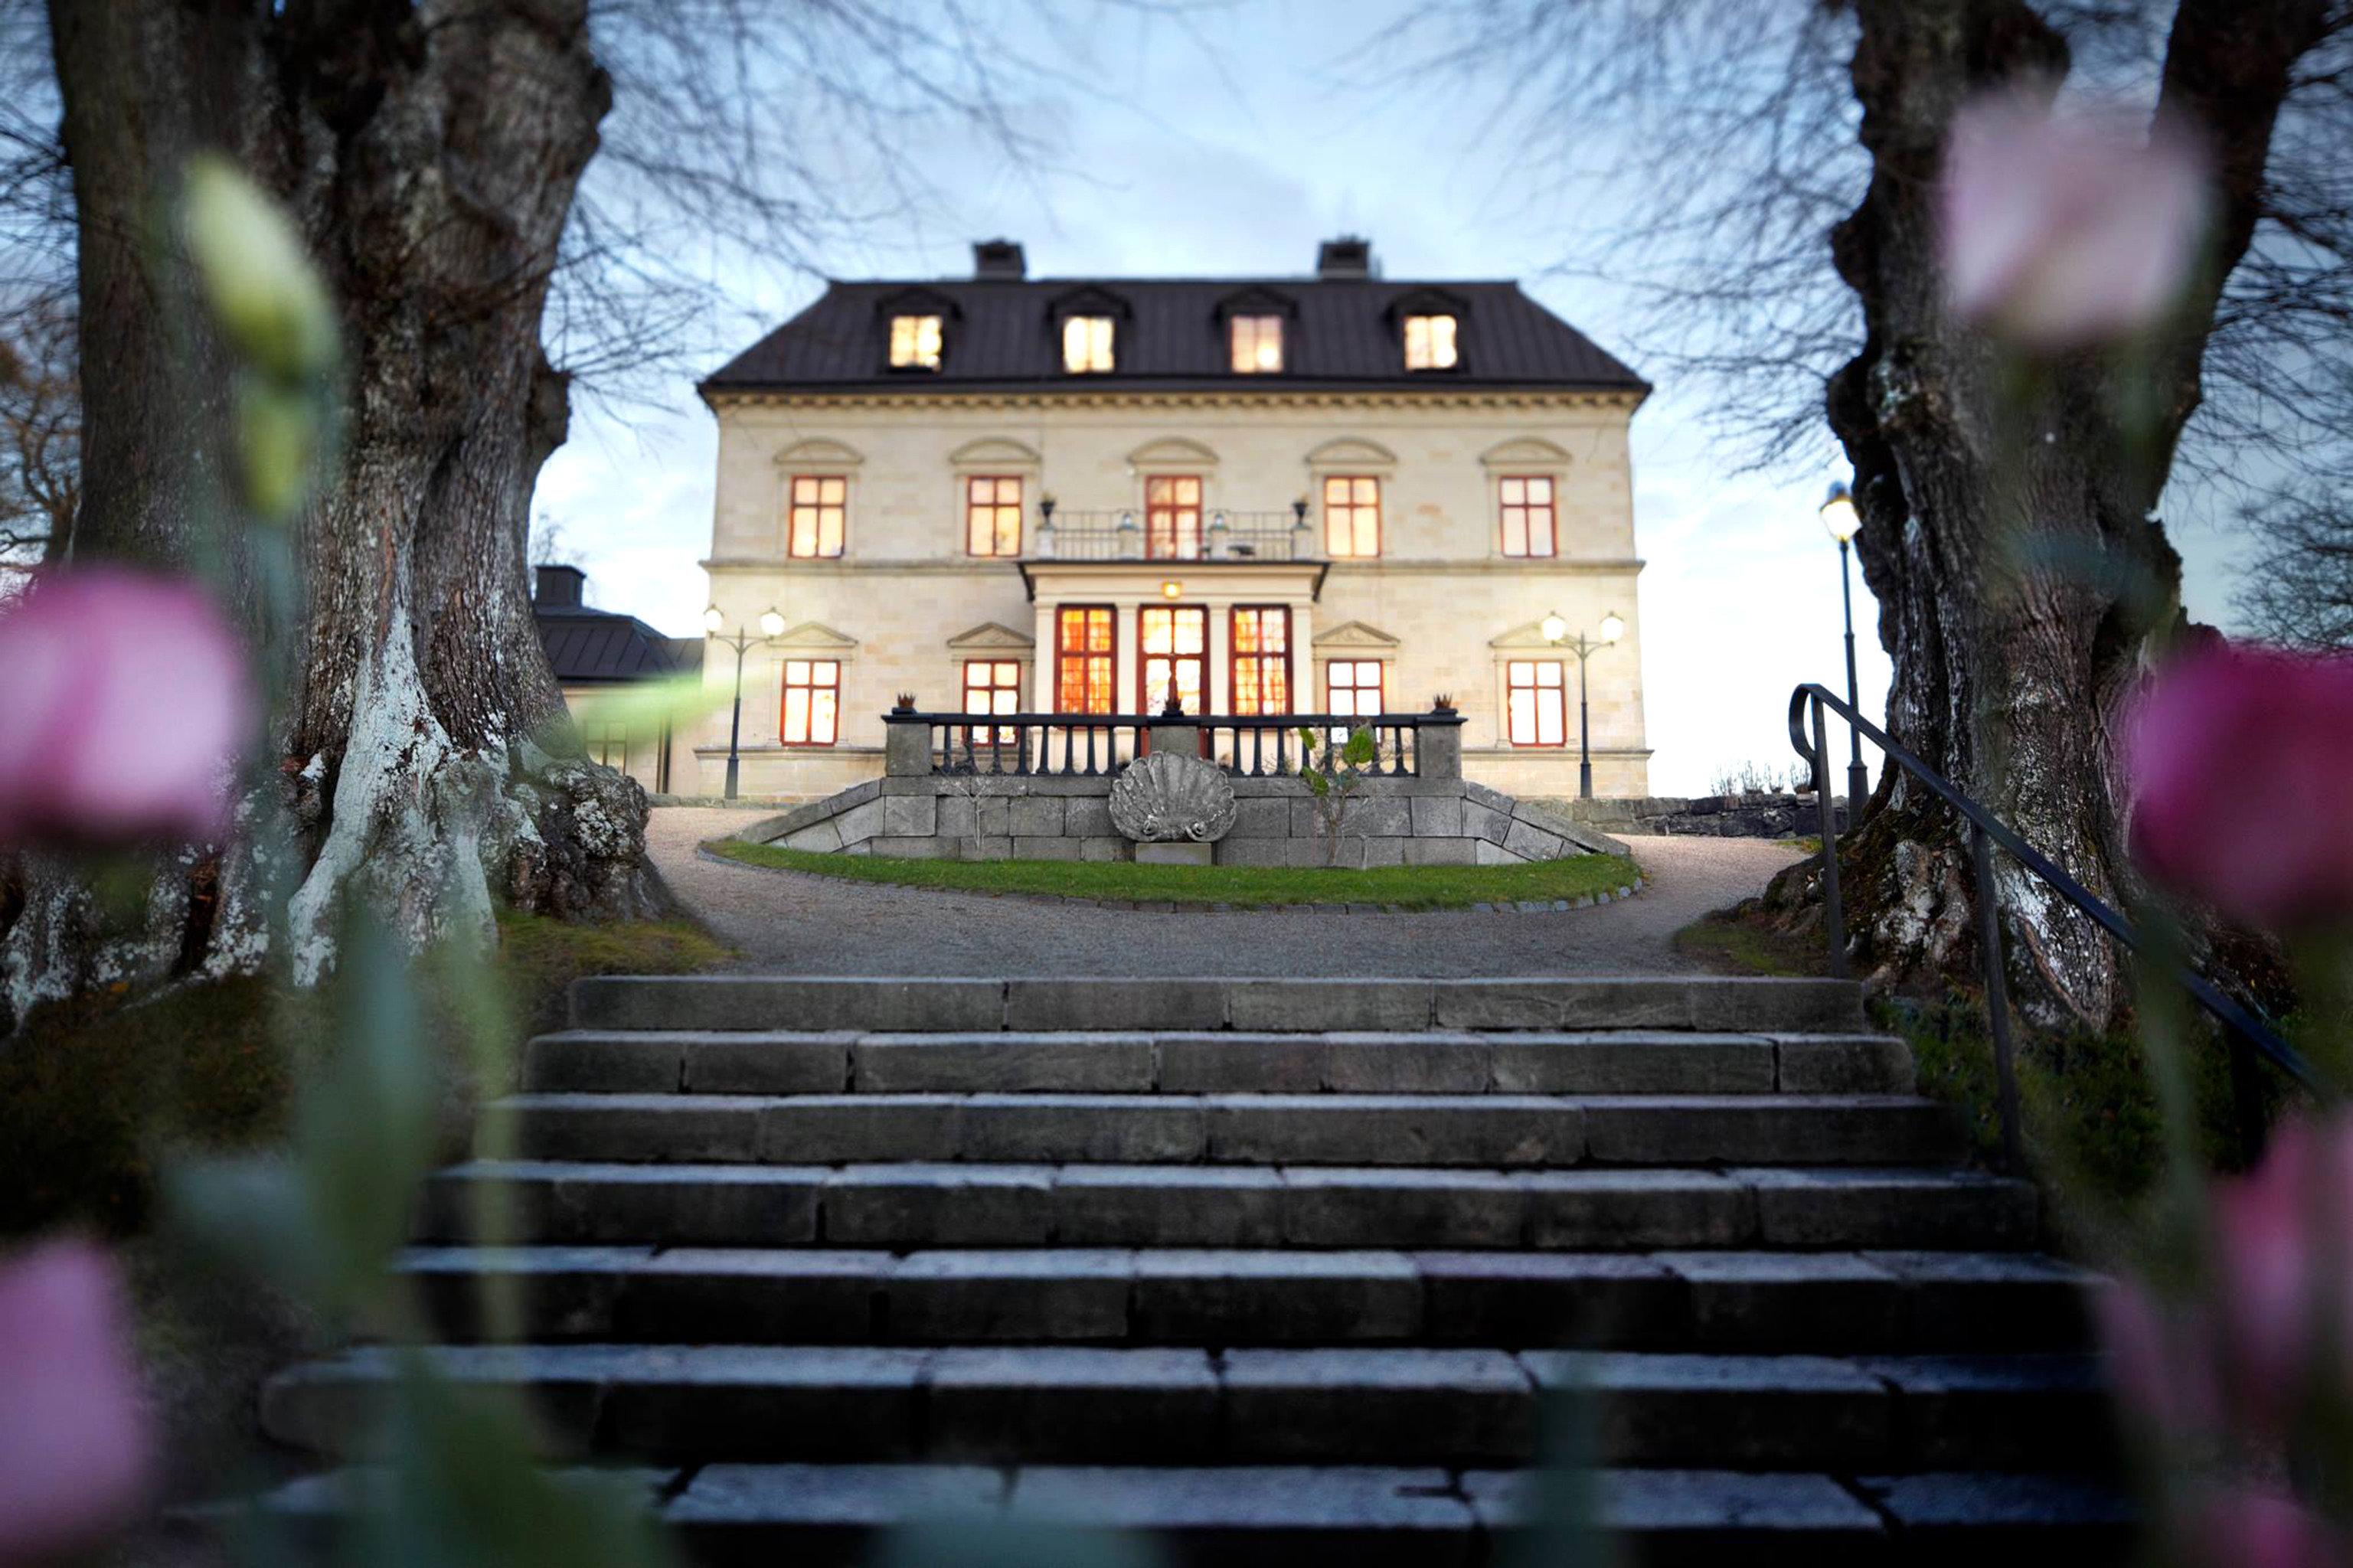 Denmark Finland Hotels Landmarks Luxury Travel Sweden tree outdoor color photograph night season flower spring autumn